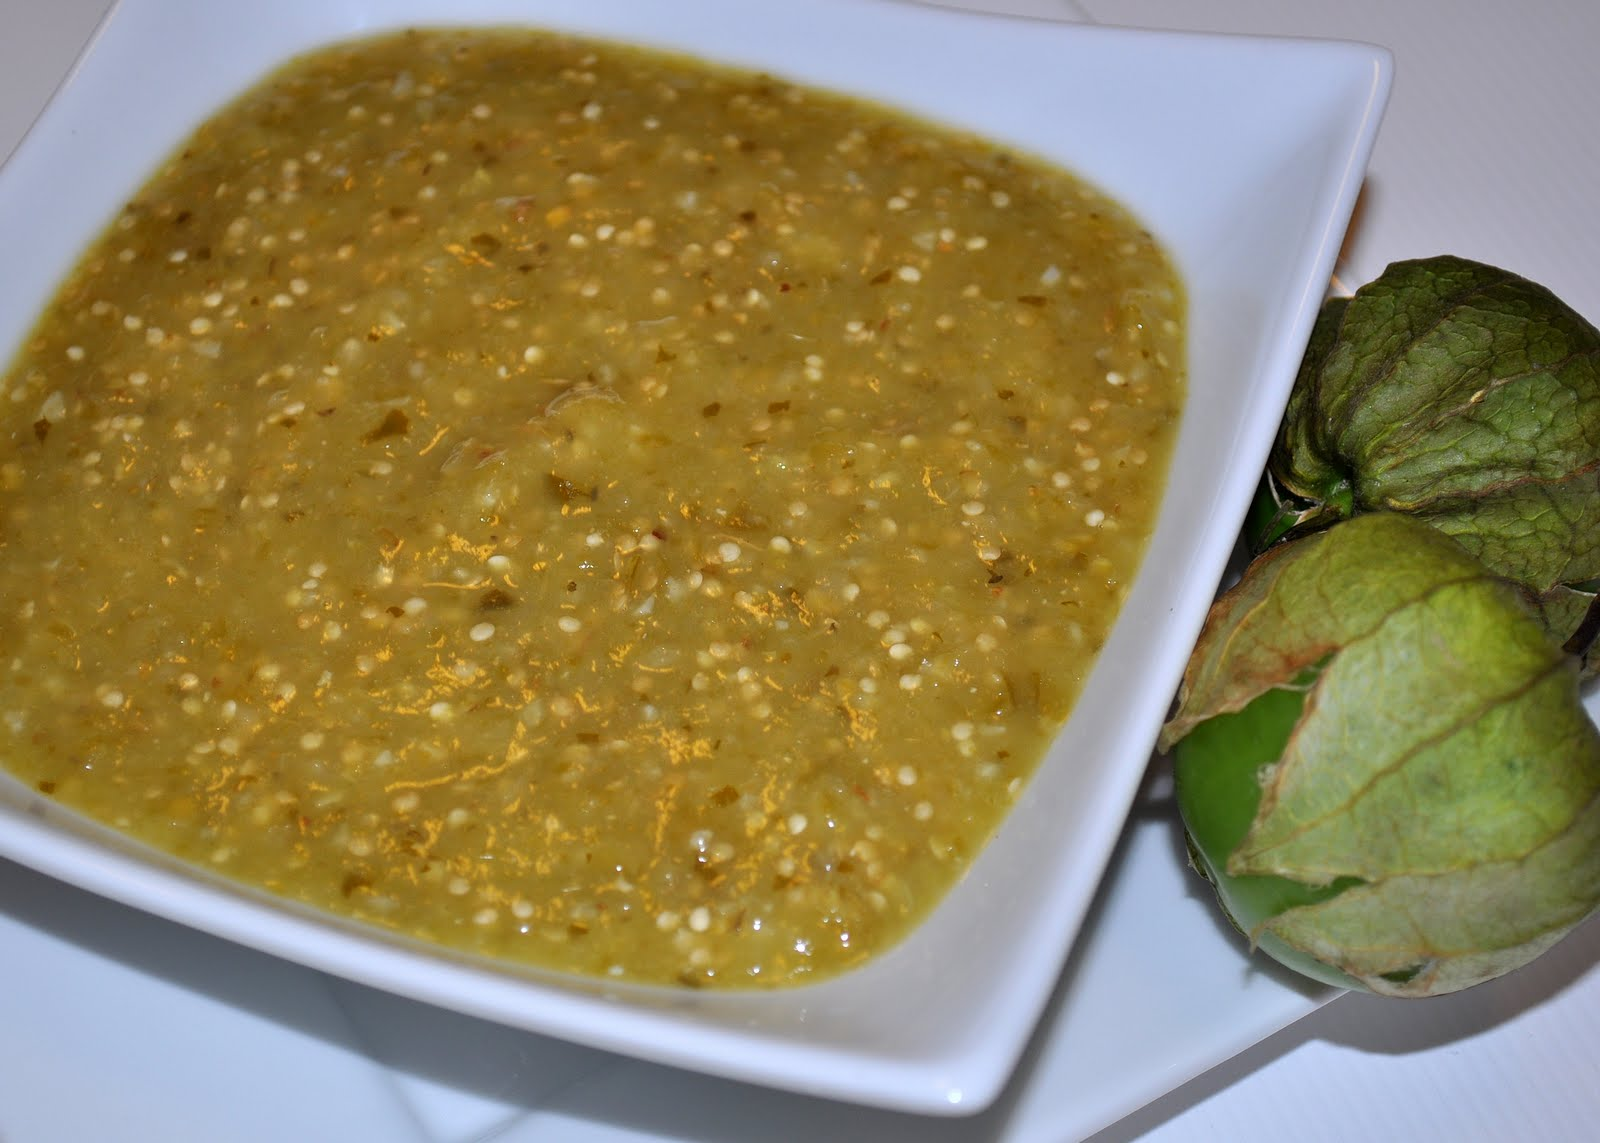 ... Jan's Kitchen?: Salsa Verde Recipe {Tomatillo Salsa or Green Salsa